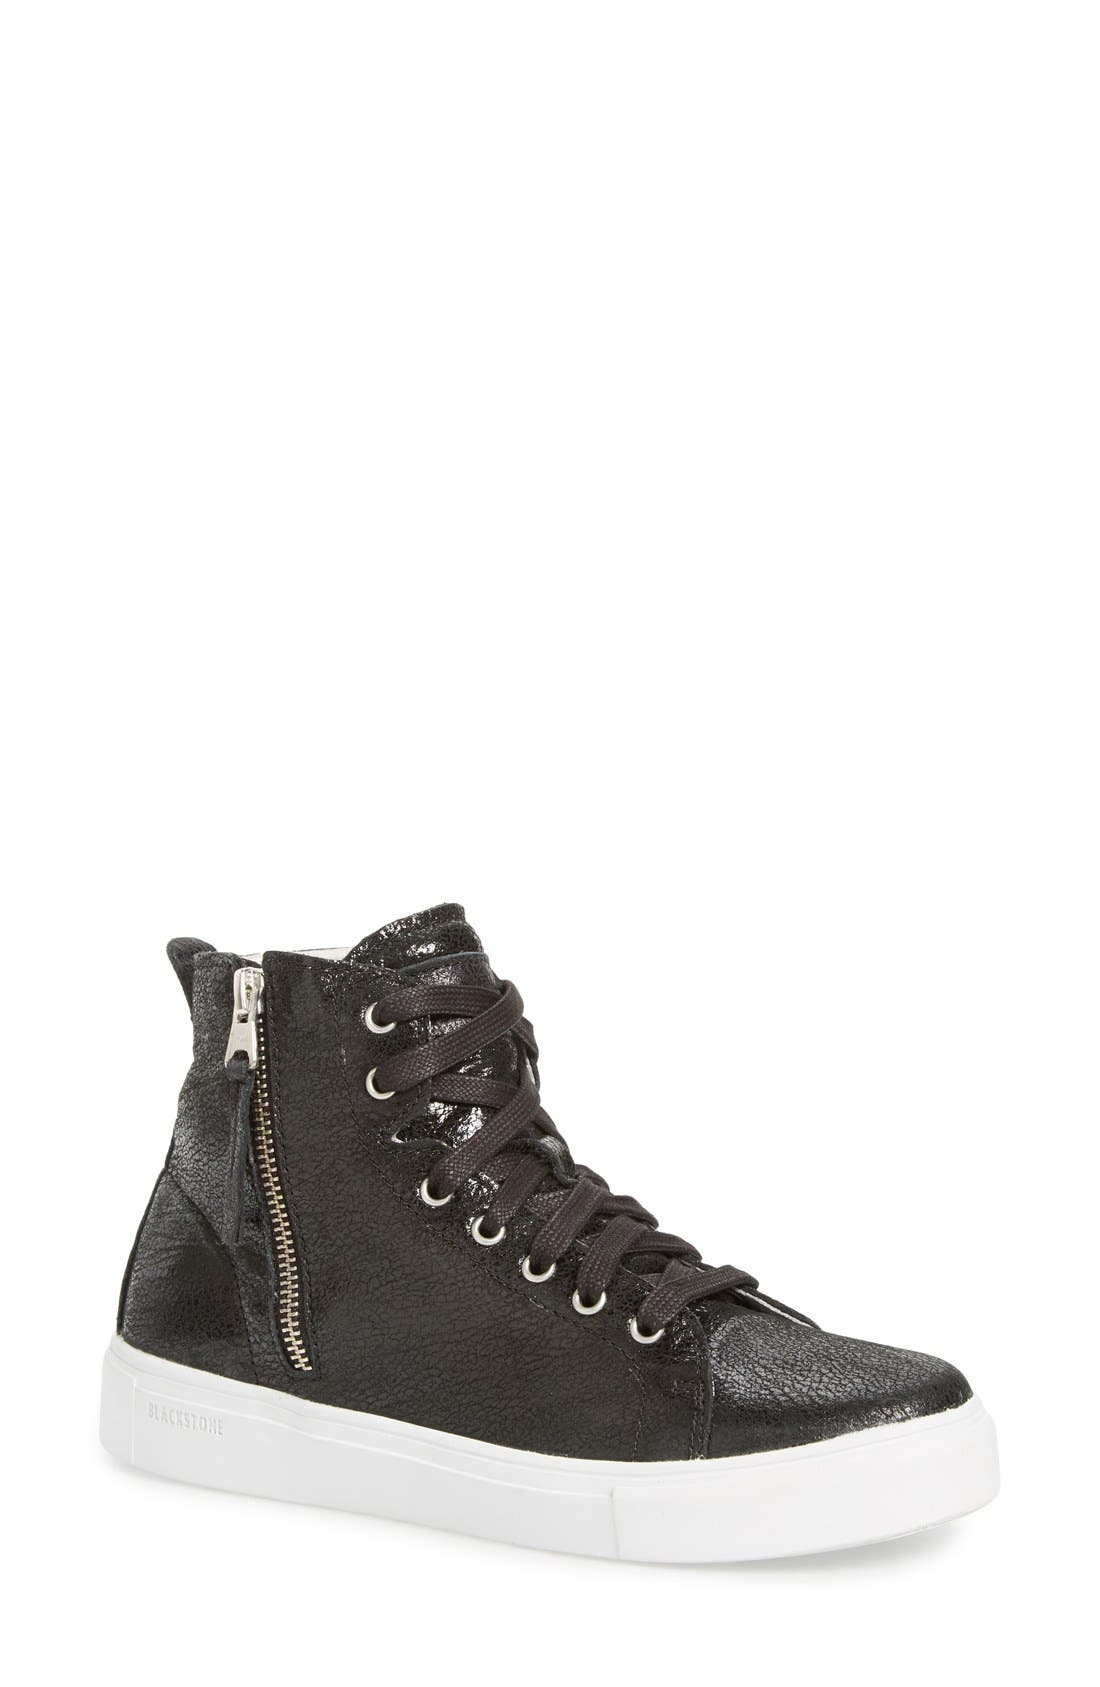 BLACKSTONE 'LL65' High Top Sneaker